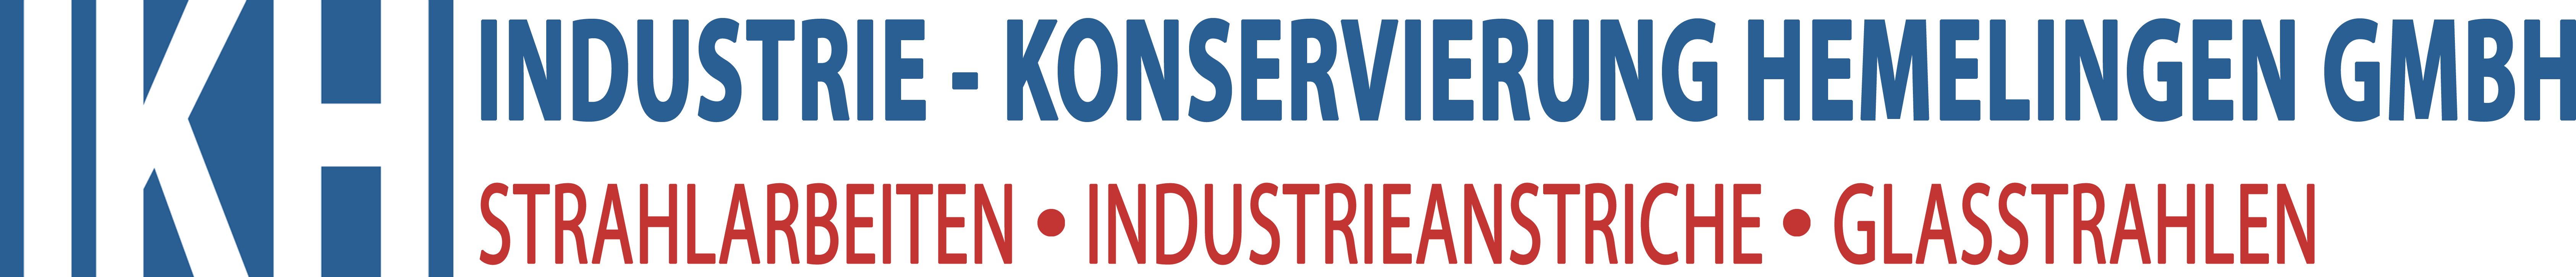 IKH Industrtie - Konservierung Hemelingen GmbH